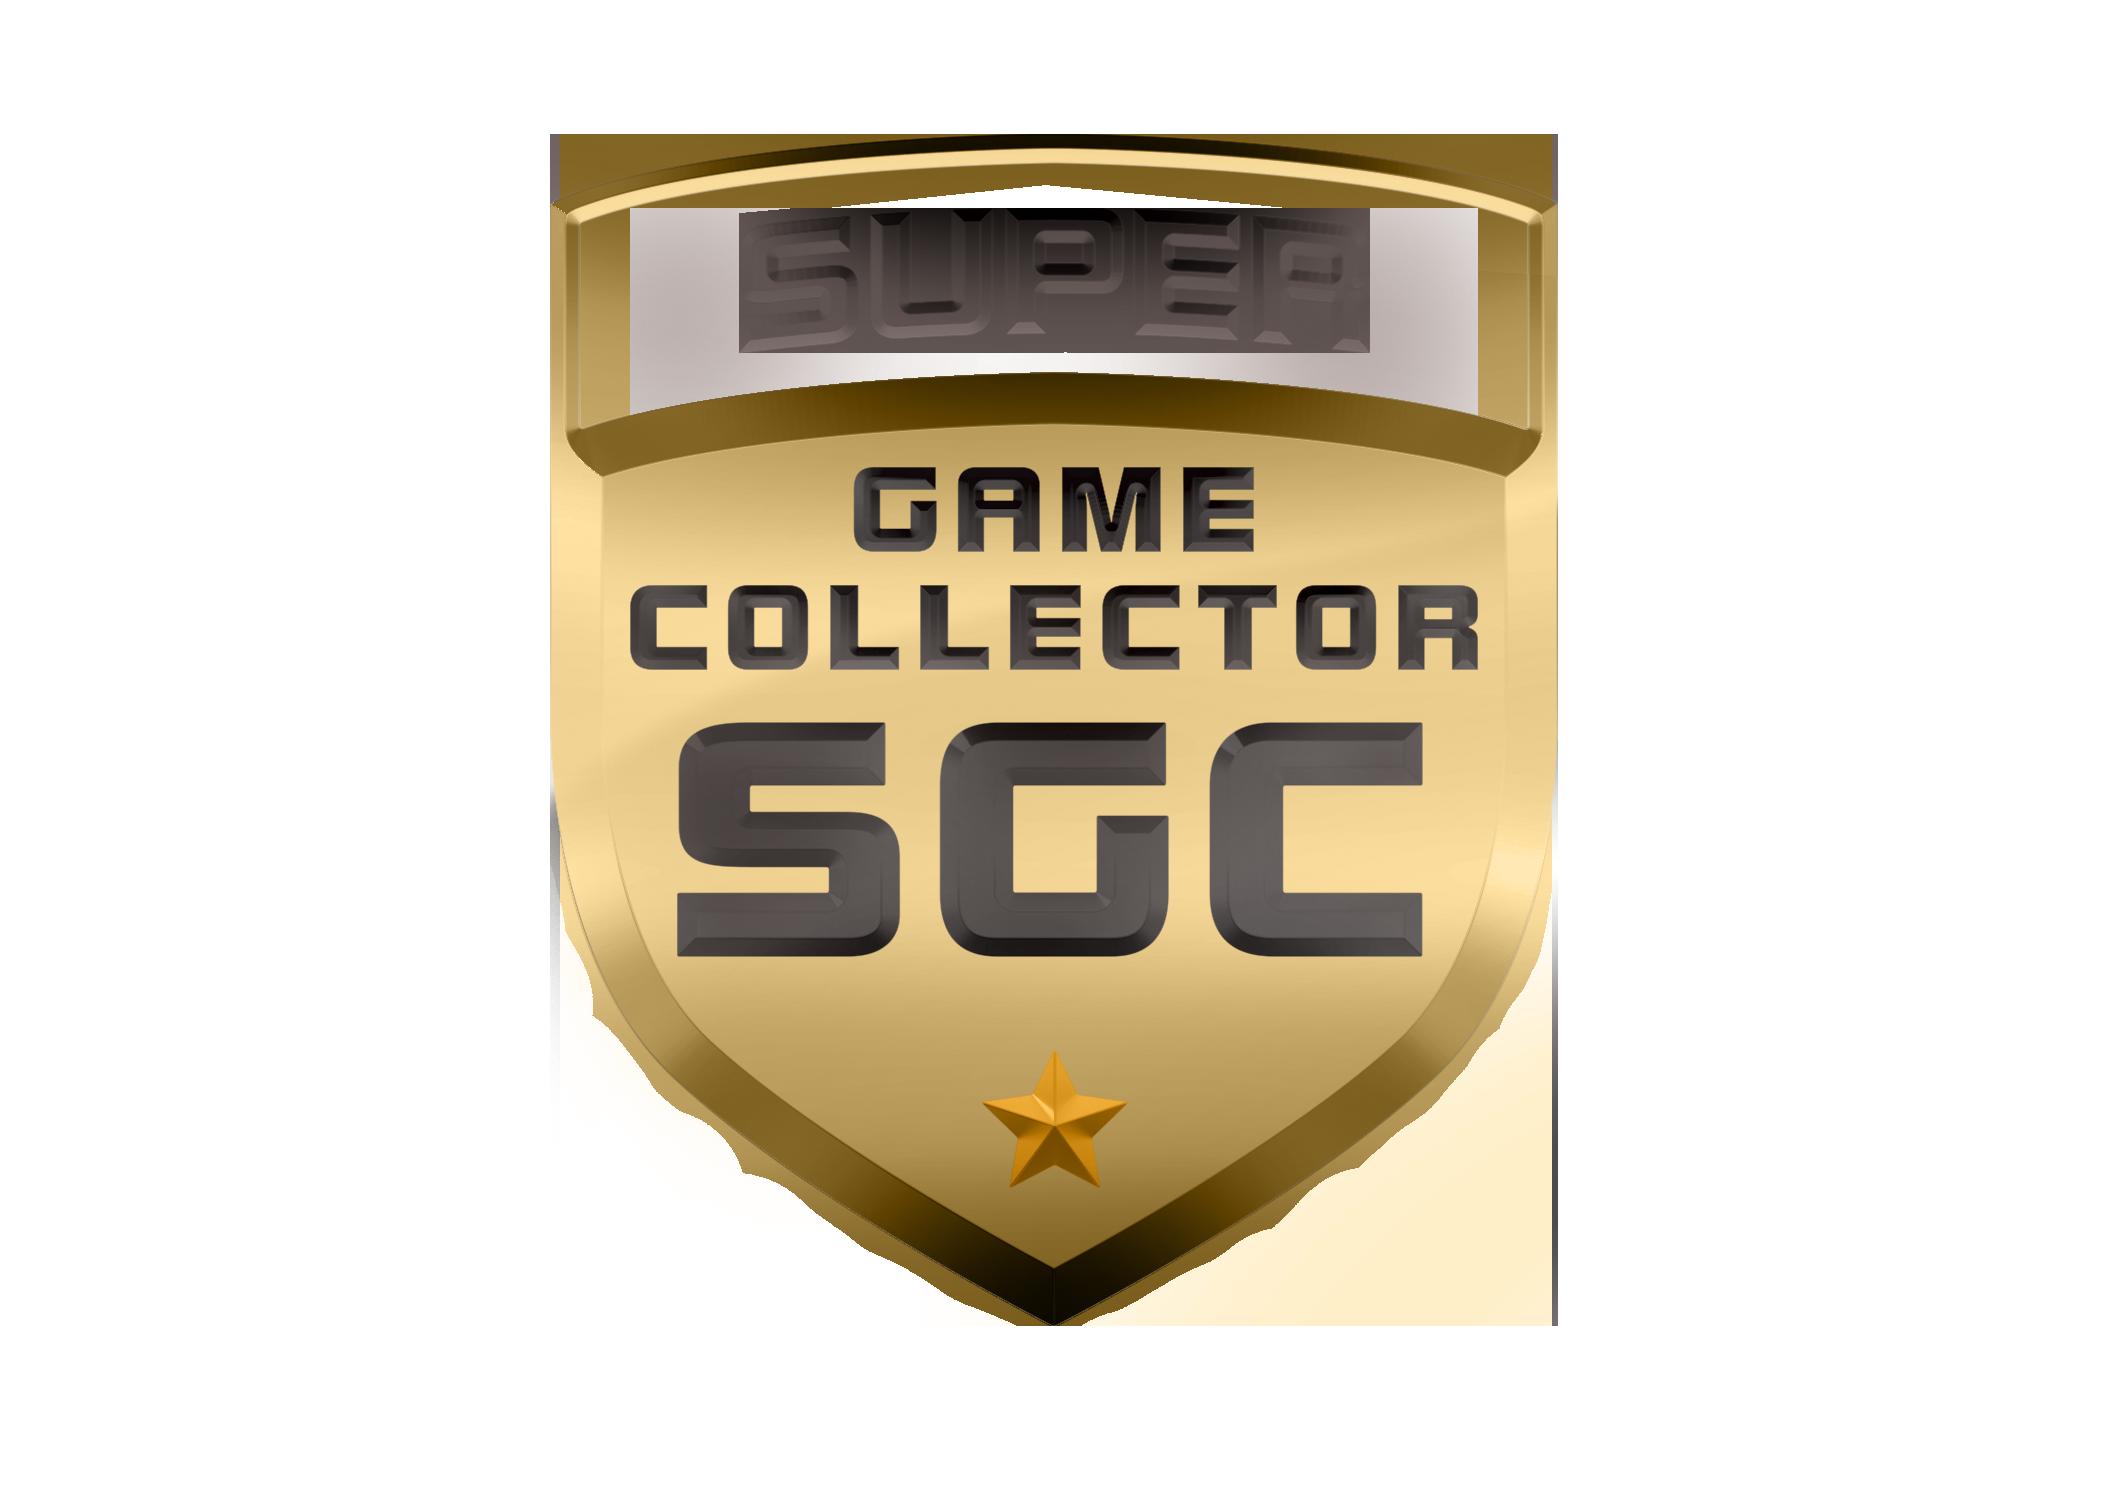 https://prismic-io.s3.amazonaws.com/fanatical/d70984c8-a515-45ca-b976-9003dd7f03df_GameCollectorBadge-3-SUPER+%281%29.png